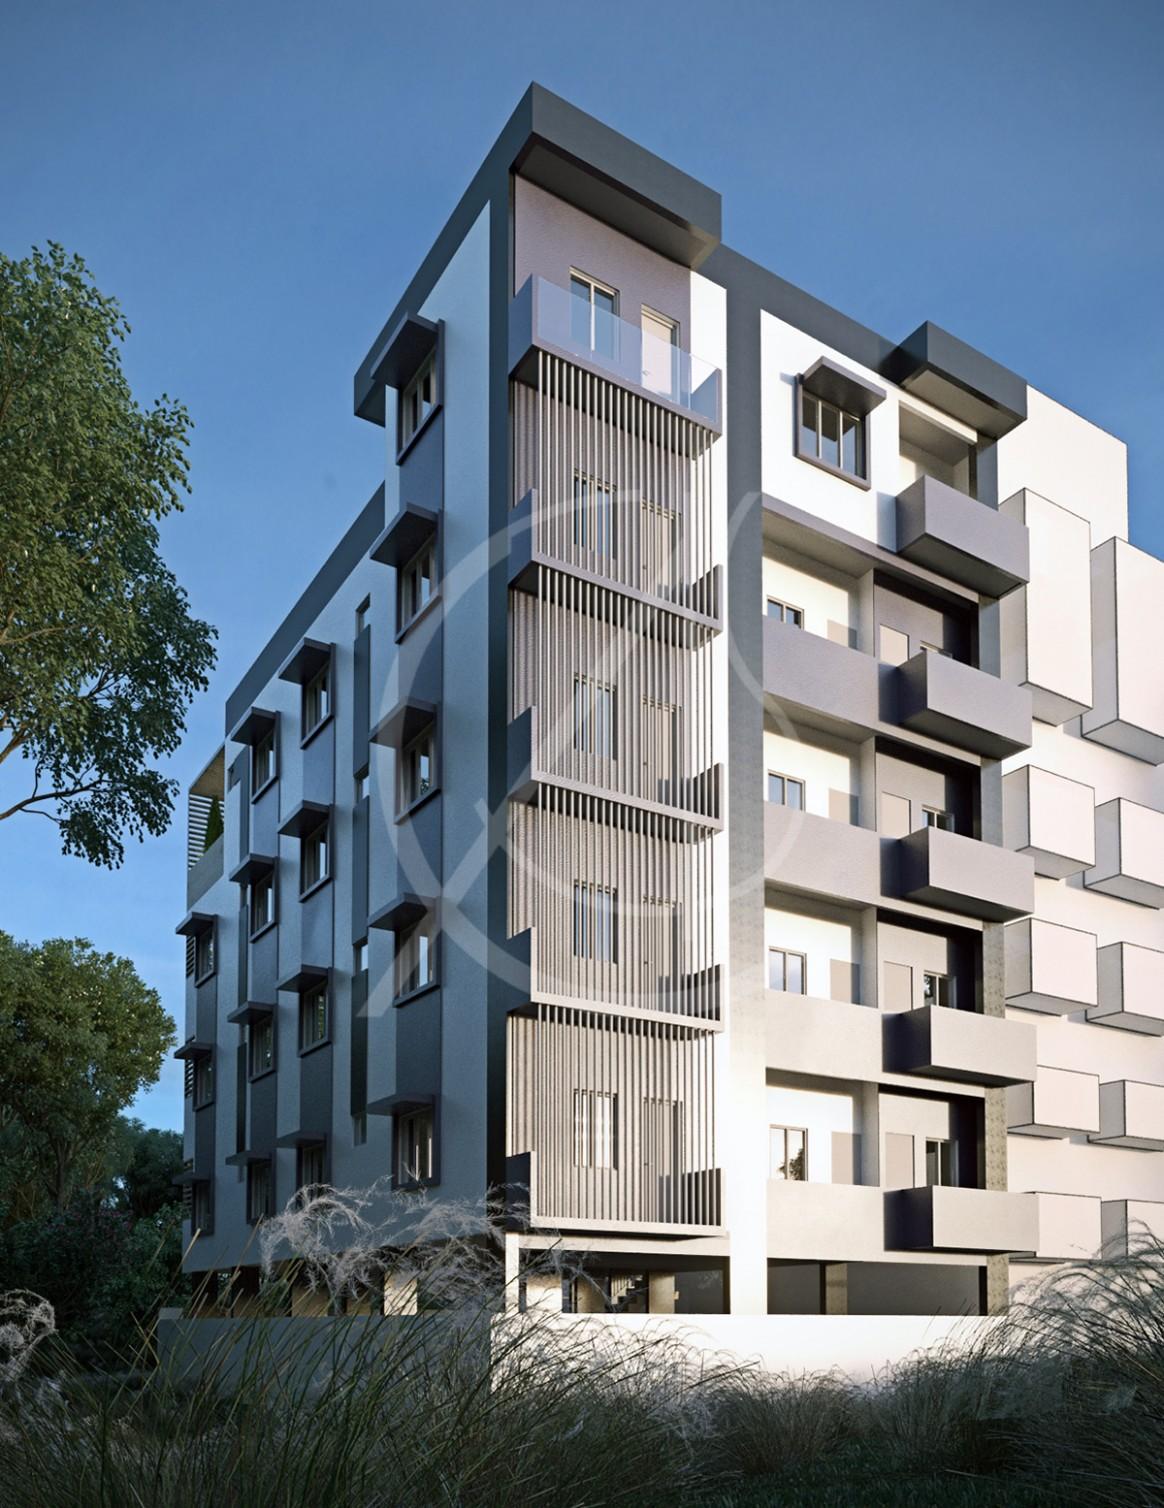 Modern Apartment Exterior Design  Comelite Architecture Structure  - Apartment Exterior Design Ideas